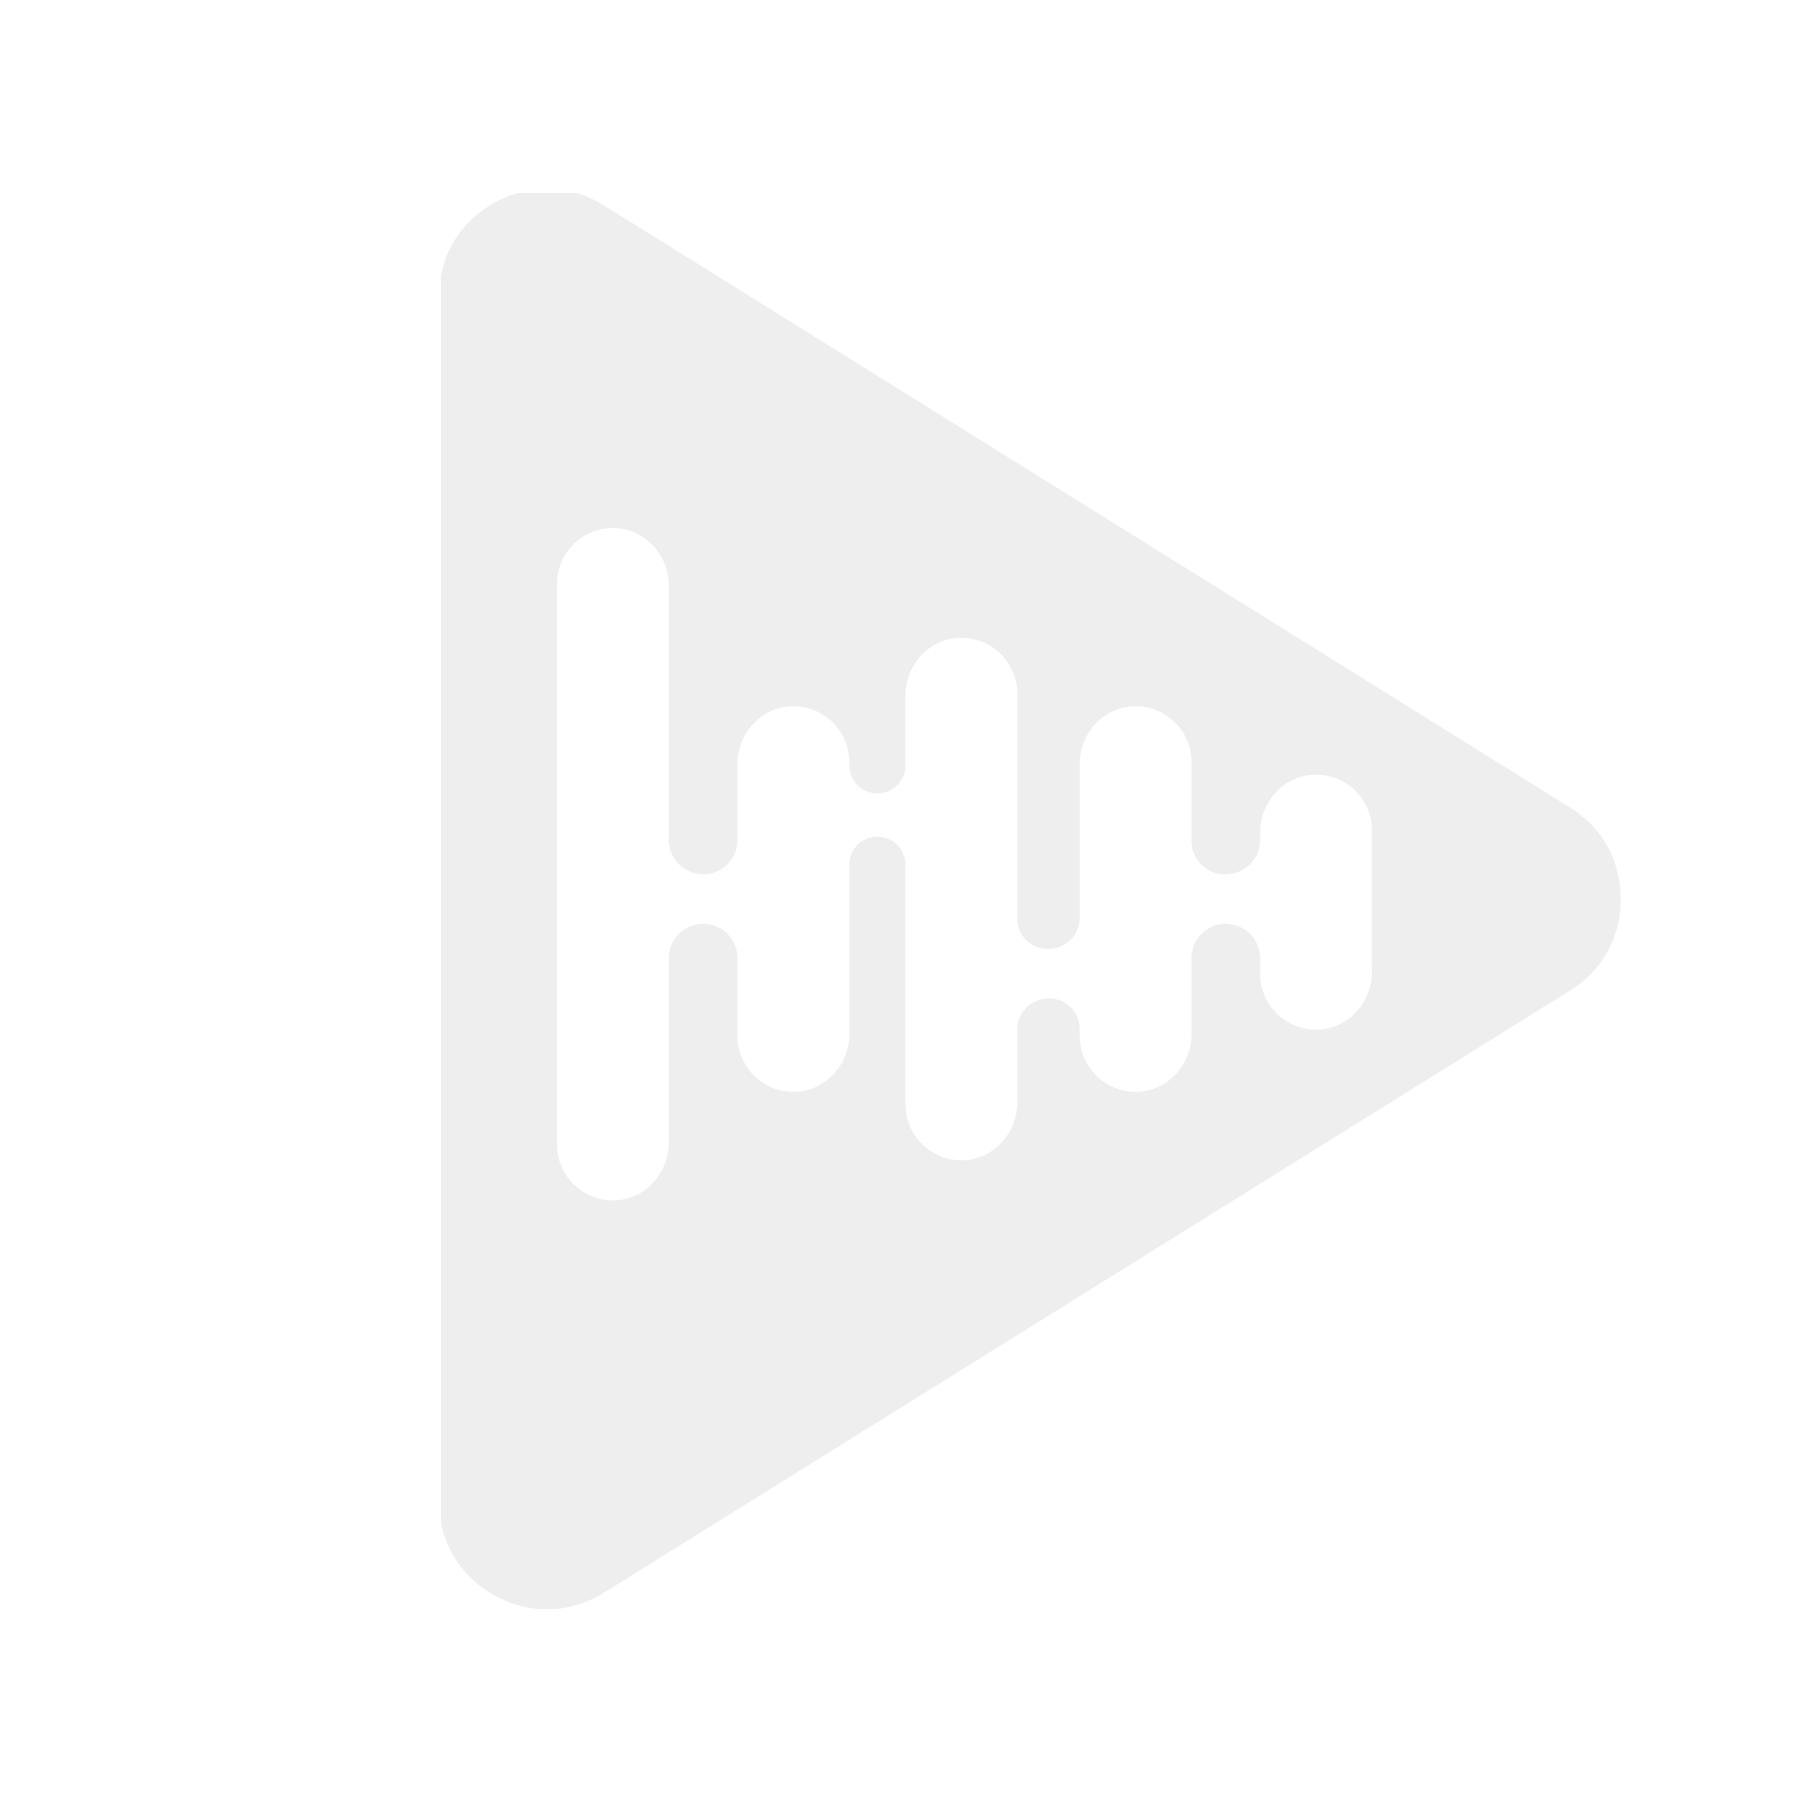 Zapco ST-6X DSP